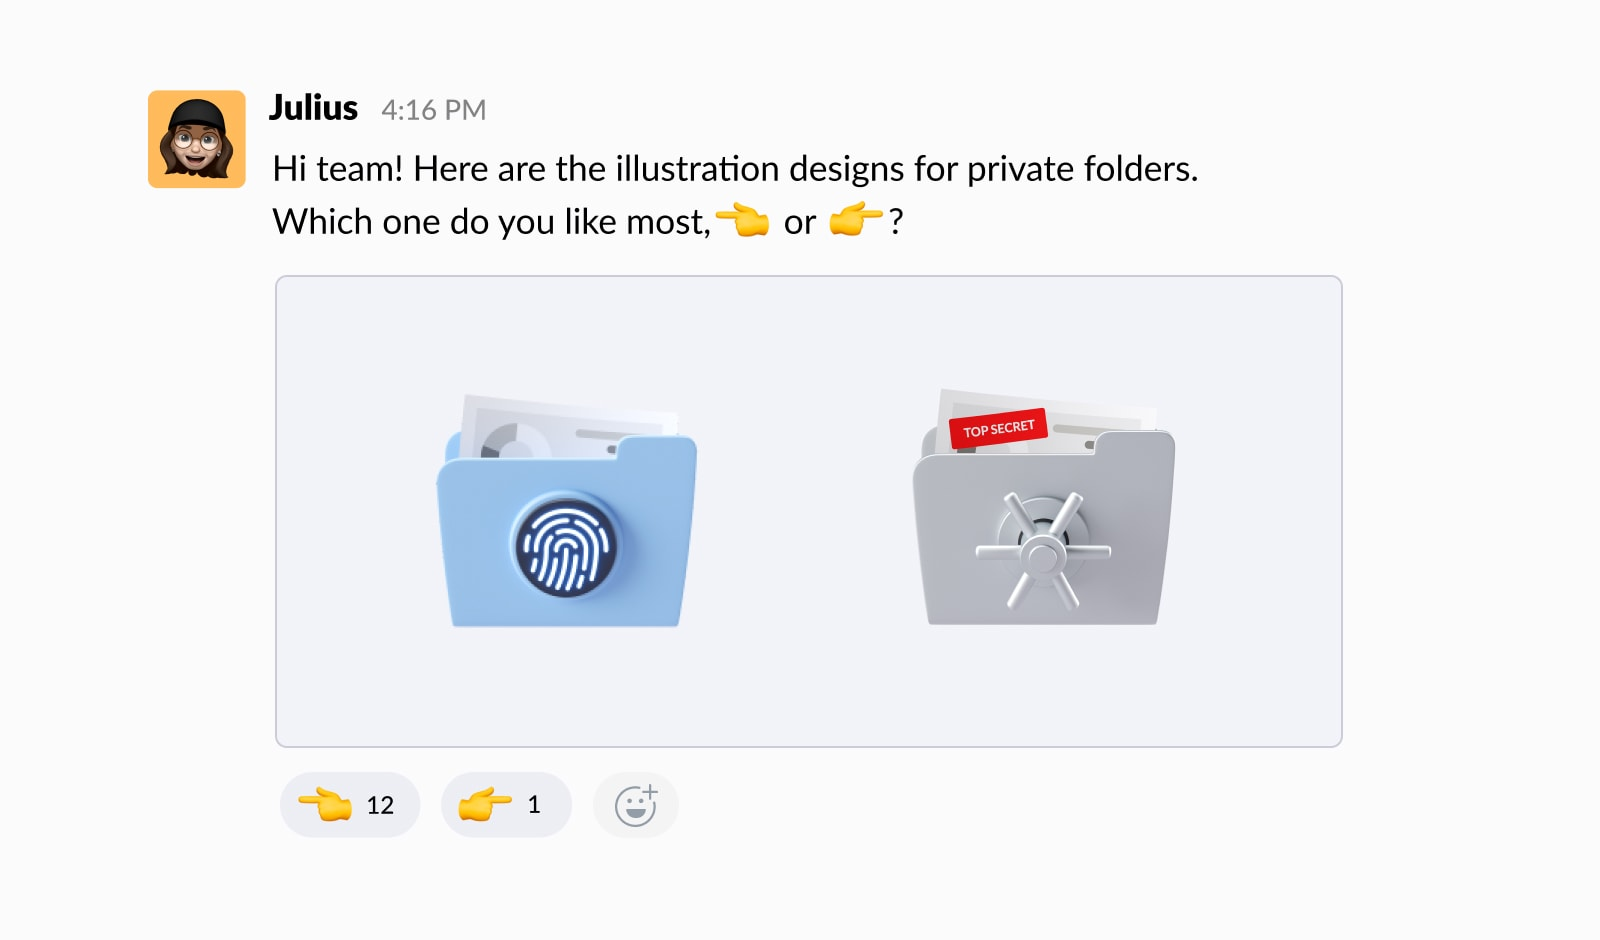 How Pitch uses Slack to get design feedback